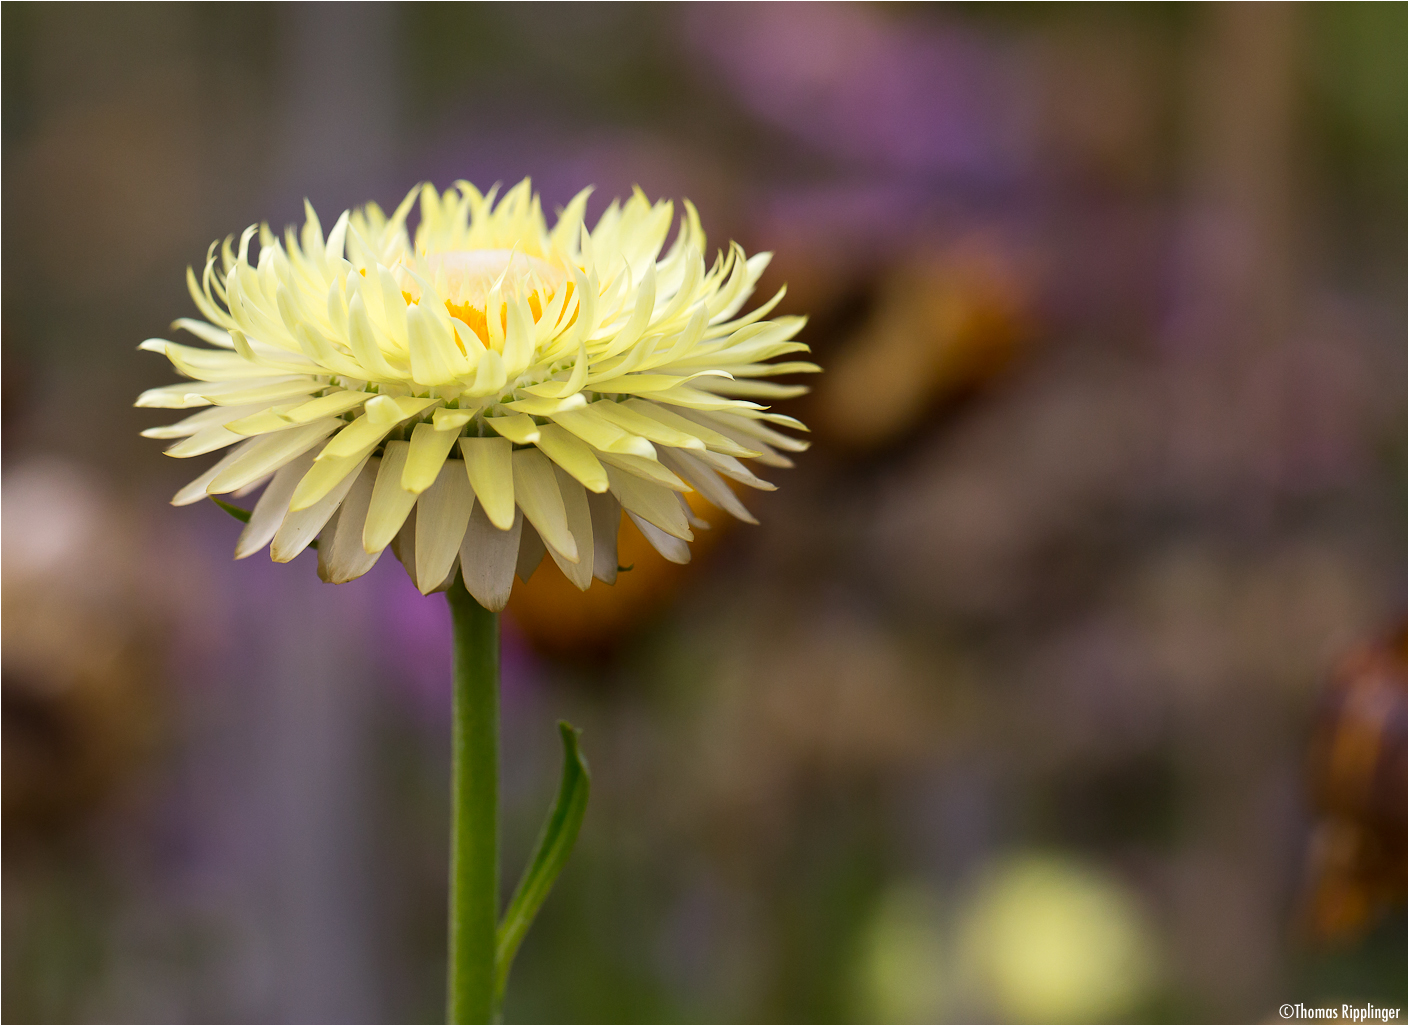 Garten-Strohblume (Helichrysum bracteatum)....